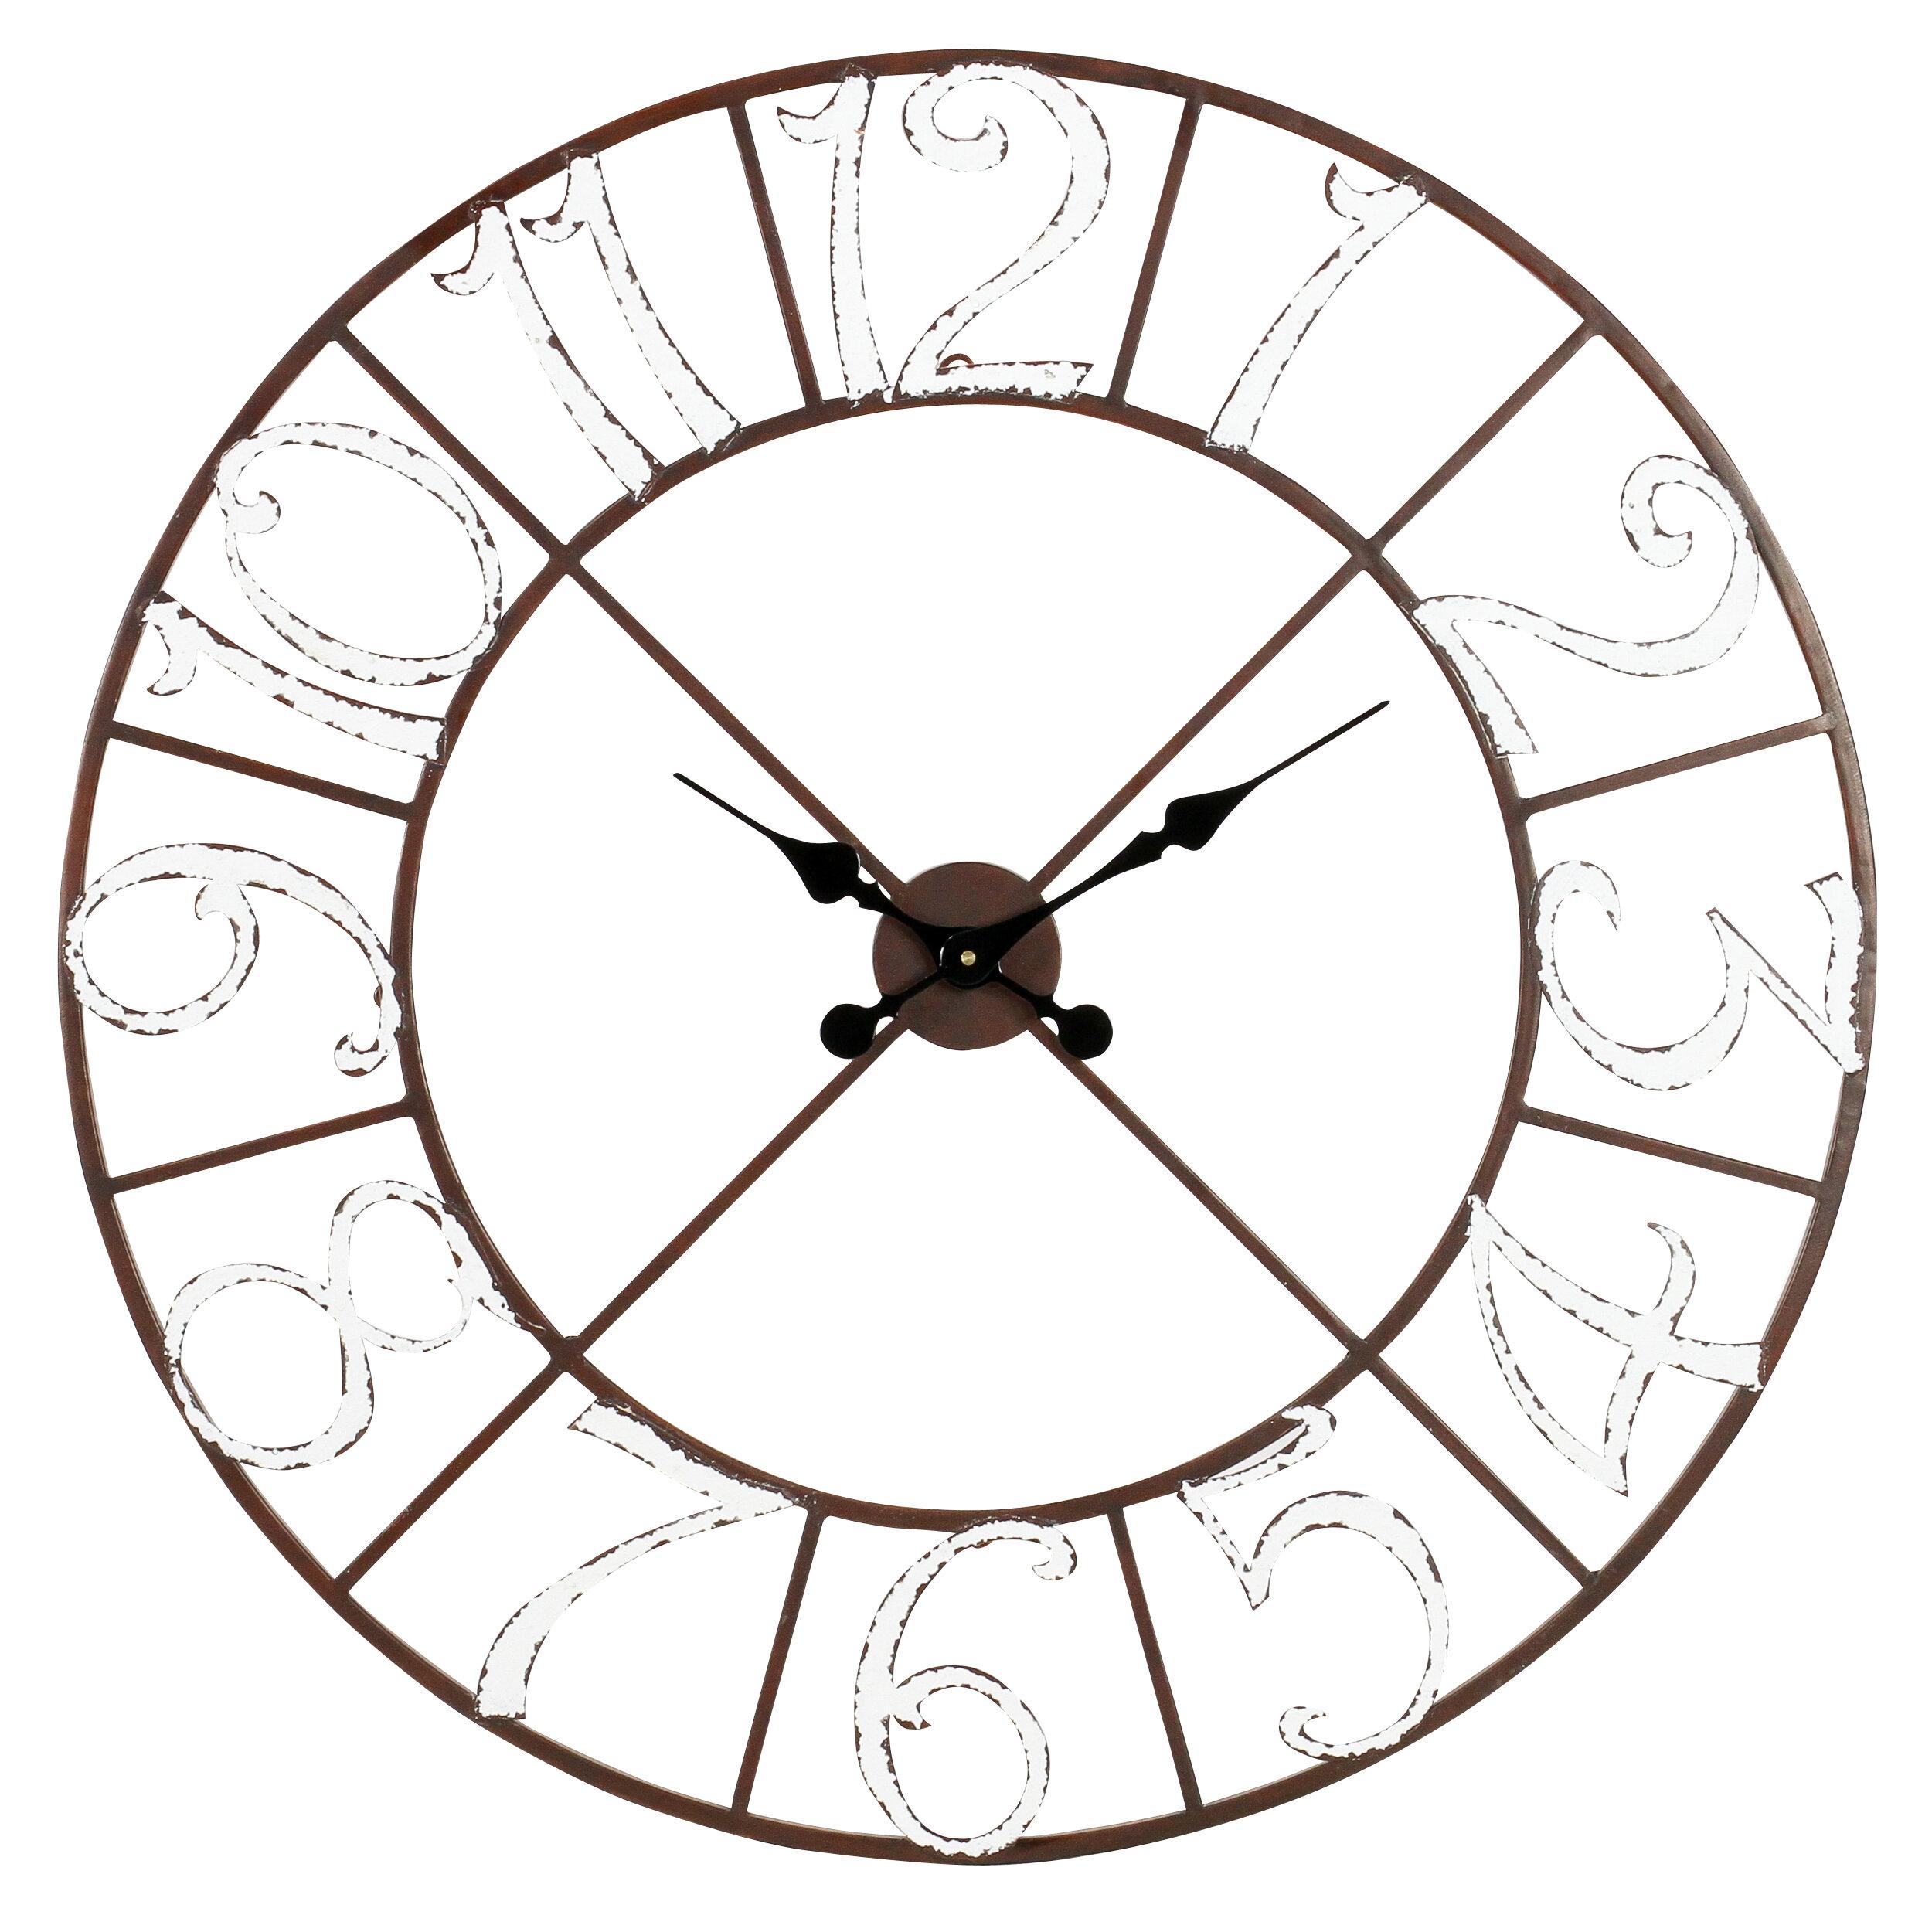 Ophelia Co Wall Clocks You Ll Love In 2021 Wayfair